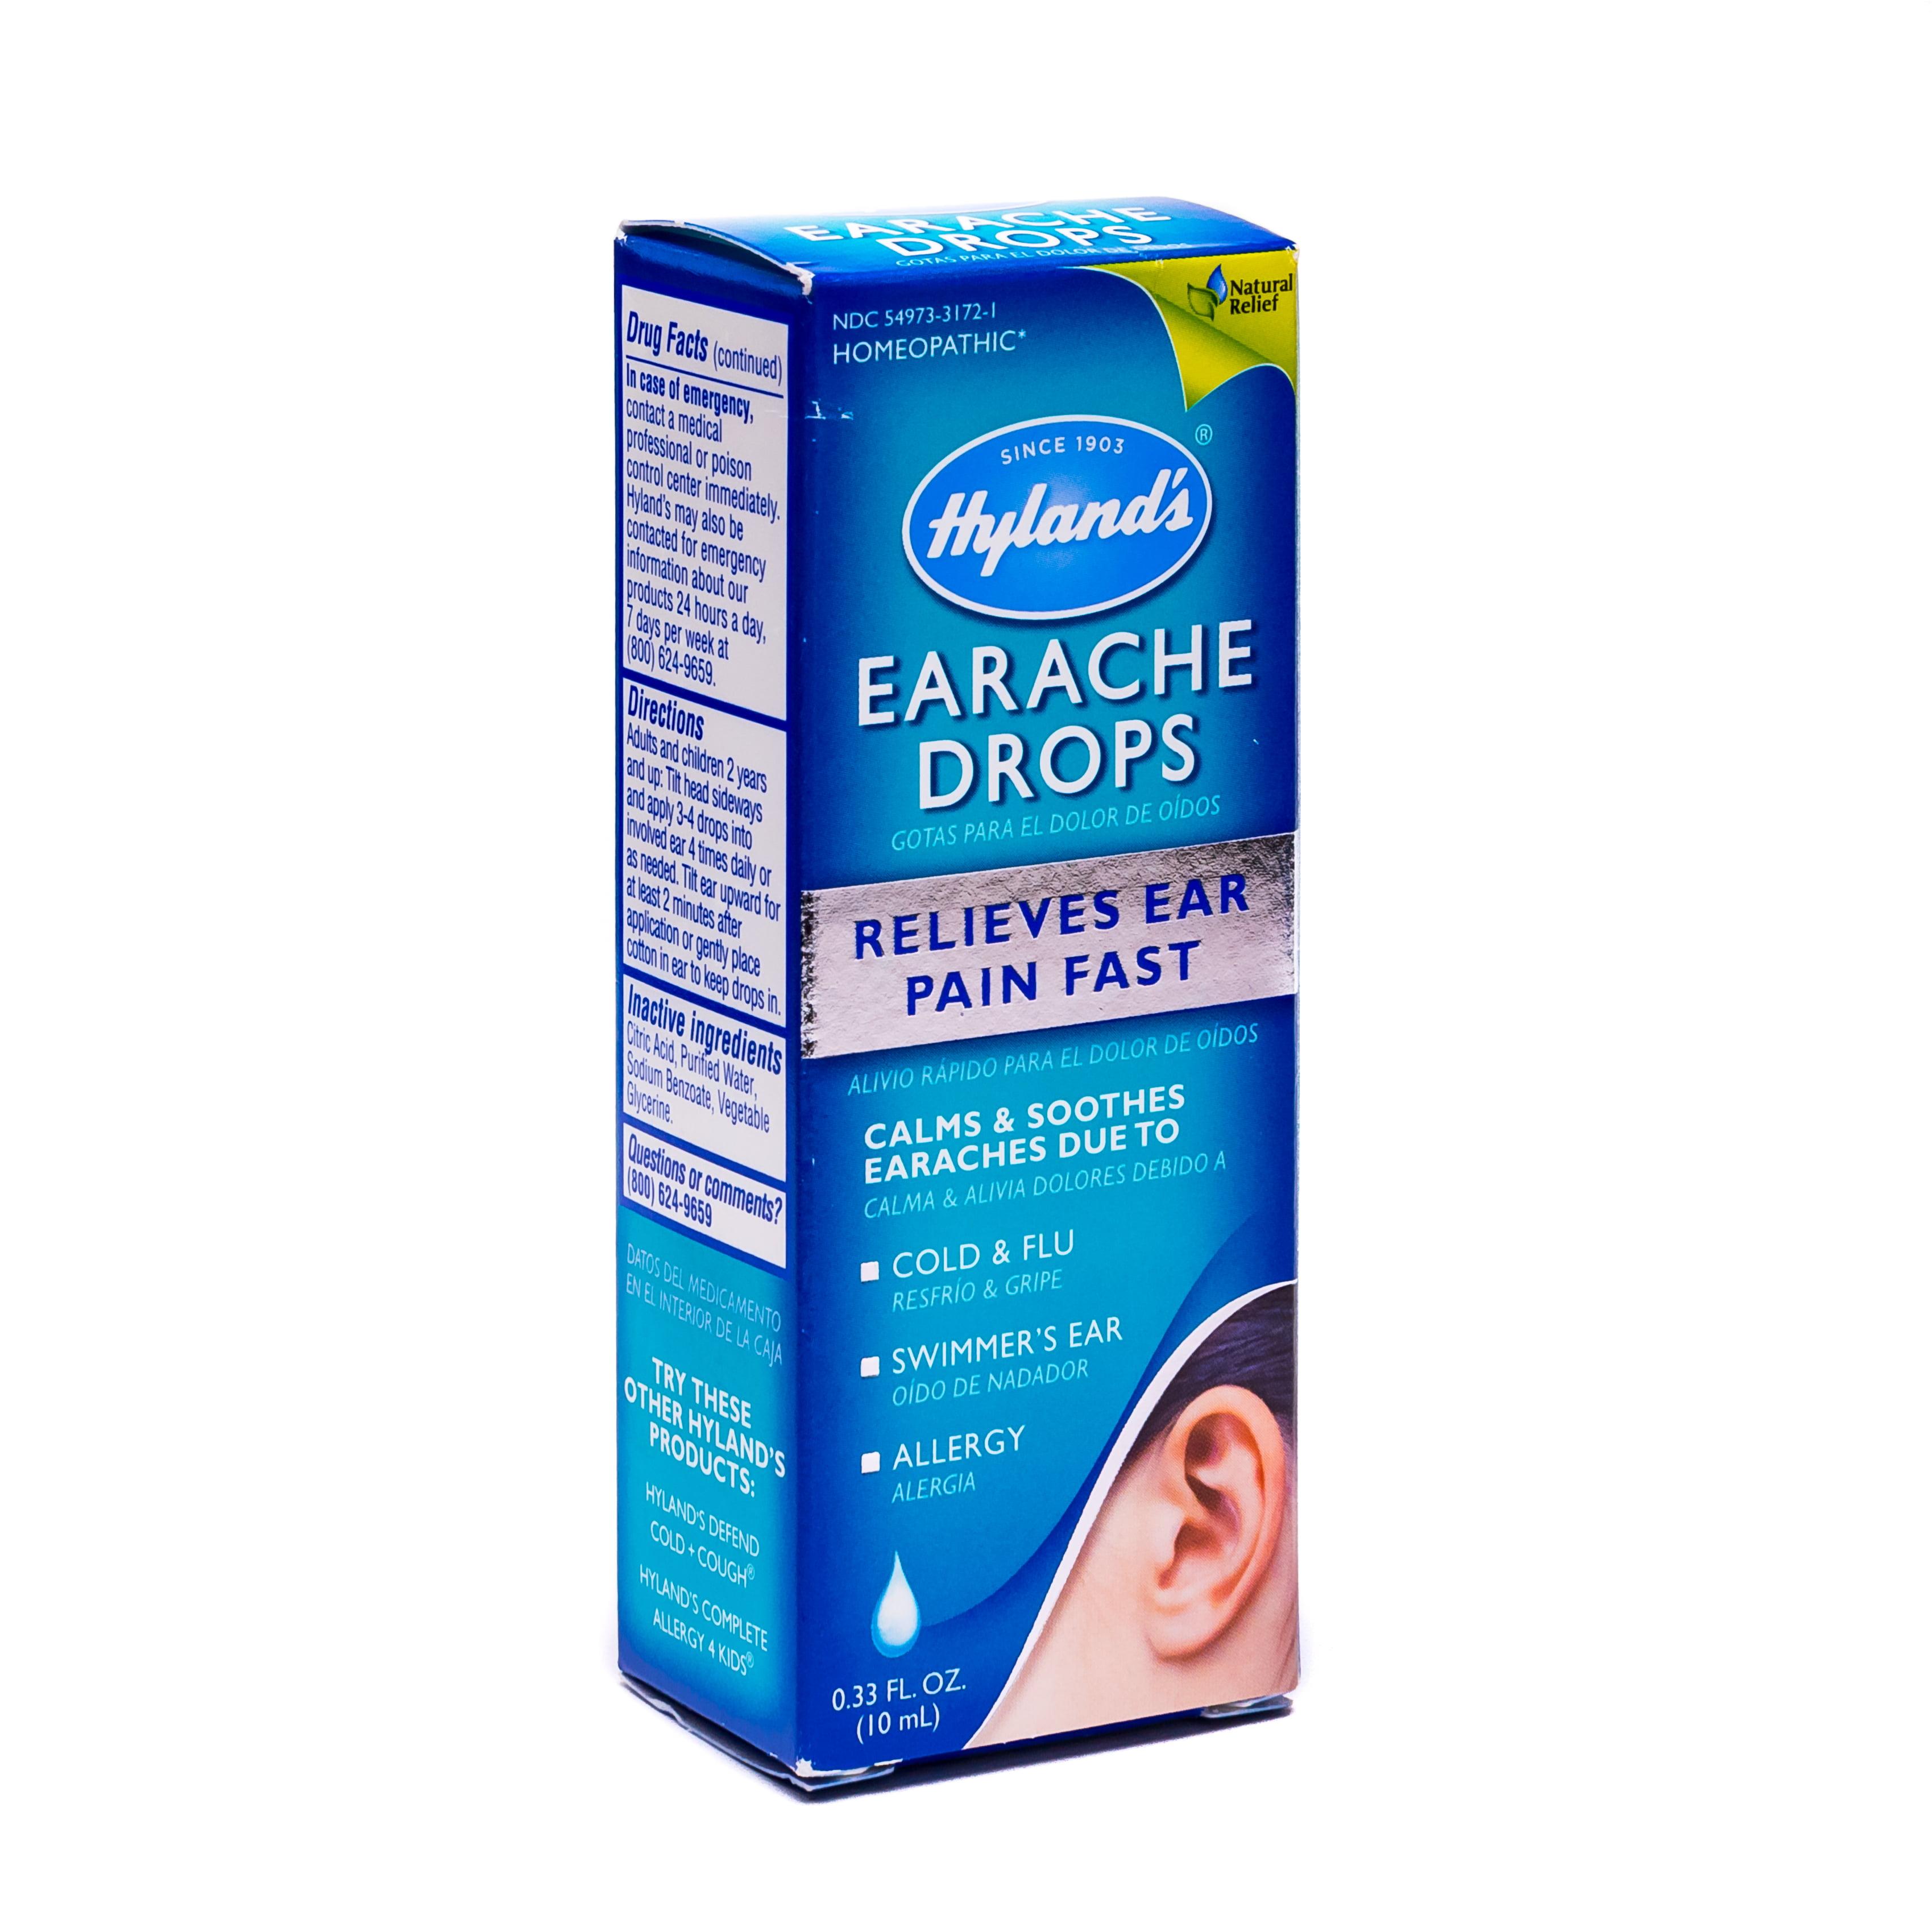 Hyland's Earache Drops, 0.33 Fl Oz